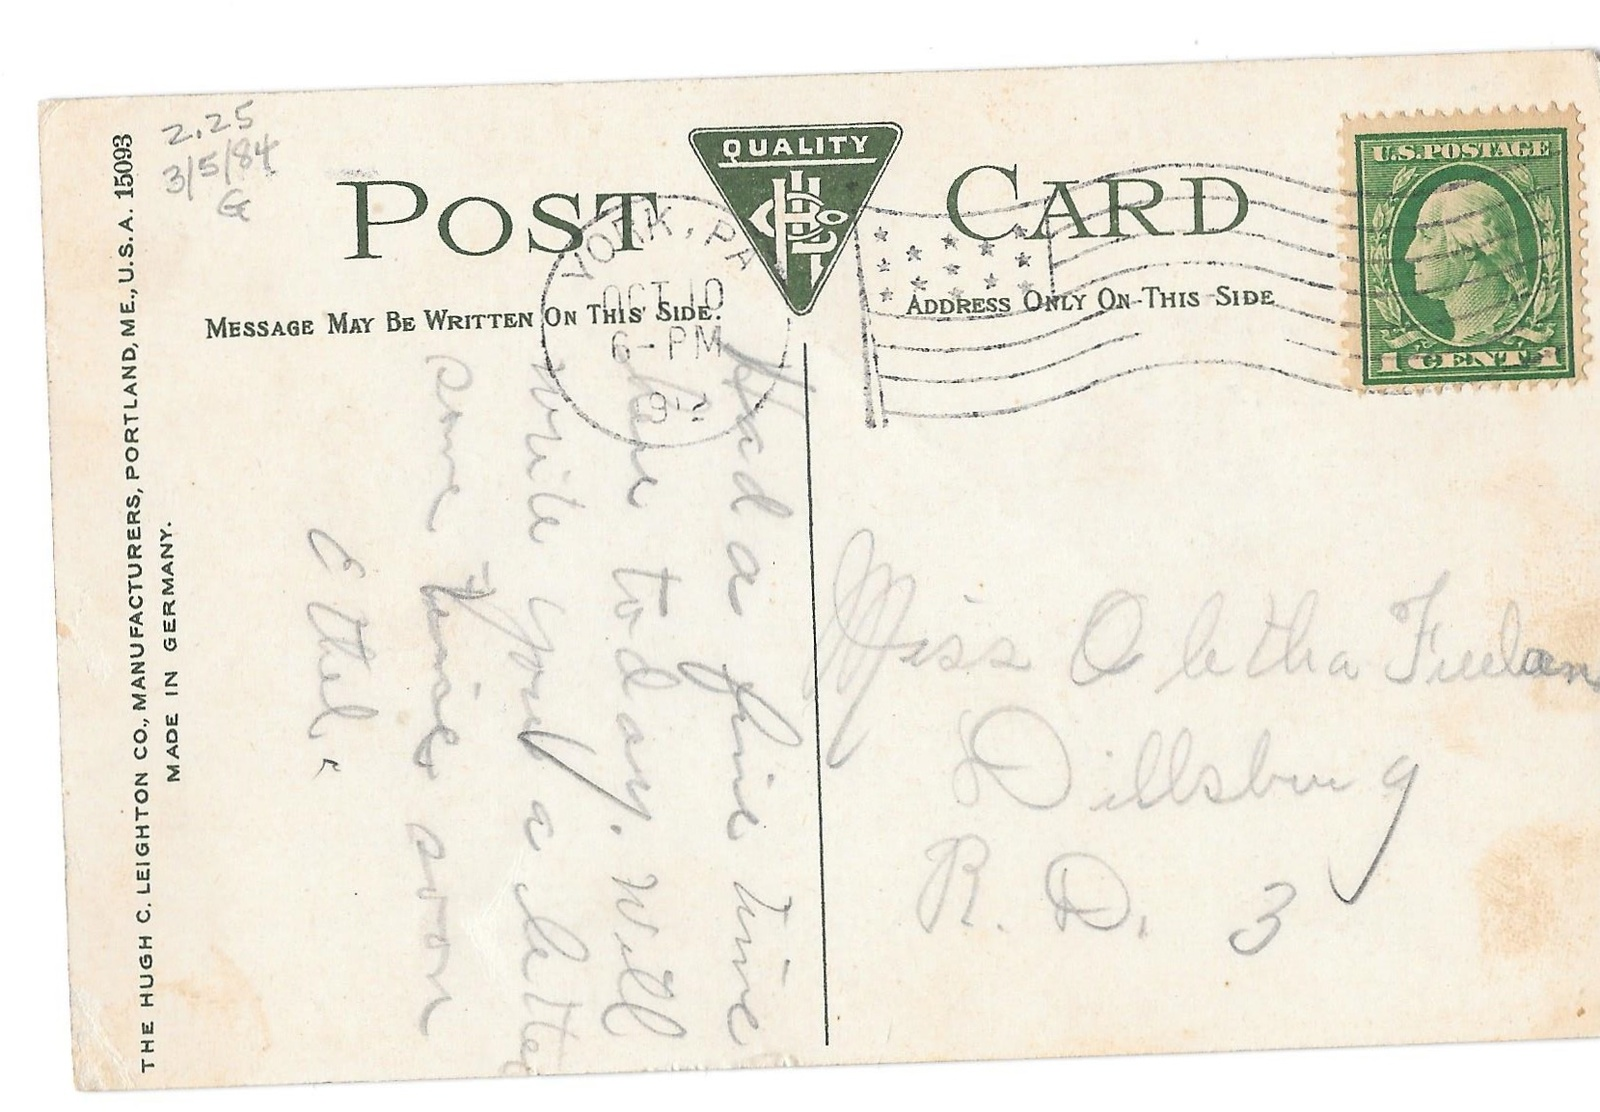 York PA Hotel Penn Horse Carriage Vntg 1912 Hugh Leighton Postcard